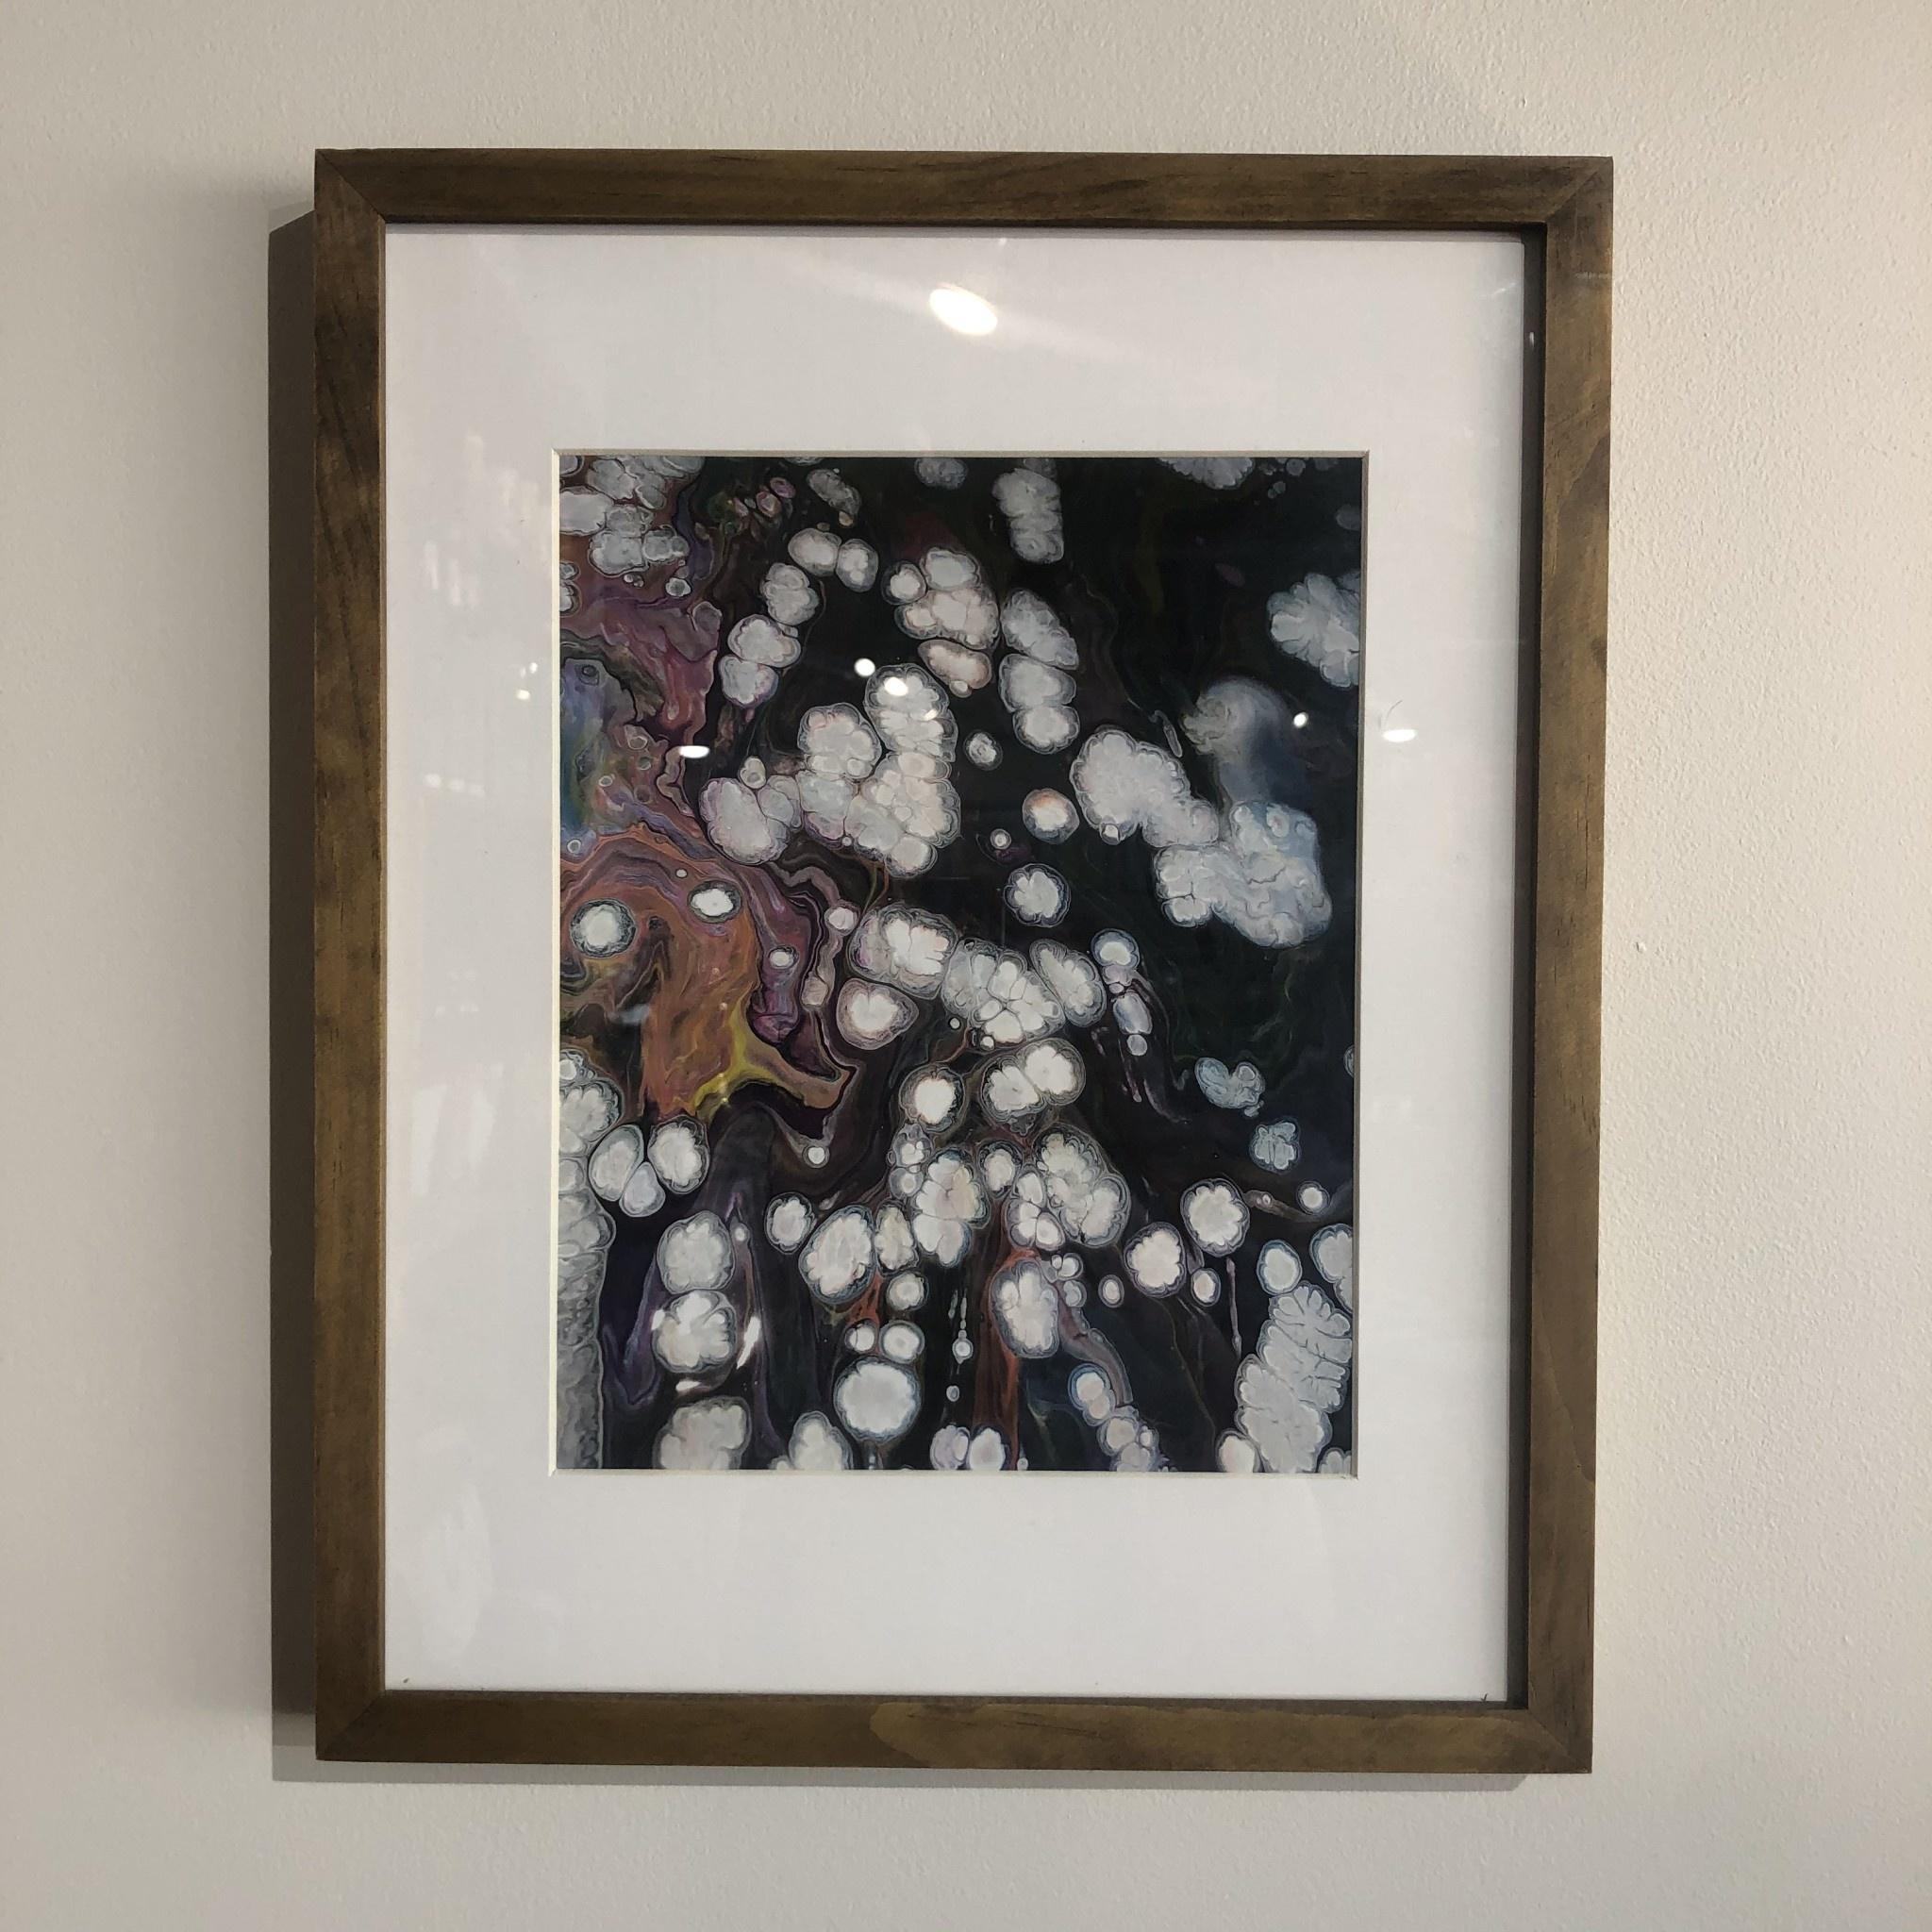 Macey Haney Artistry Macey Haney Framed Print